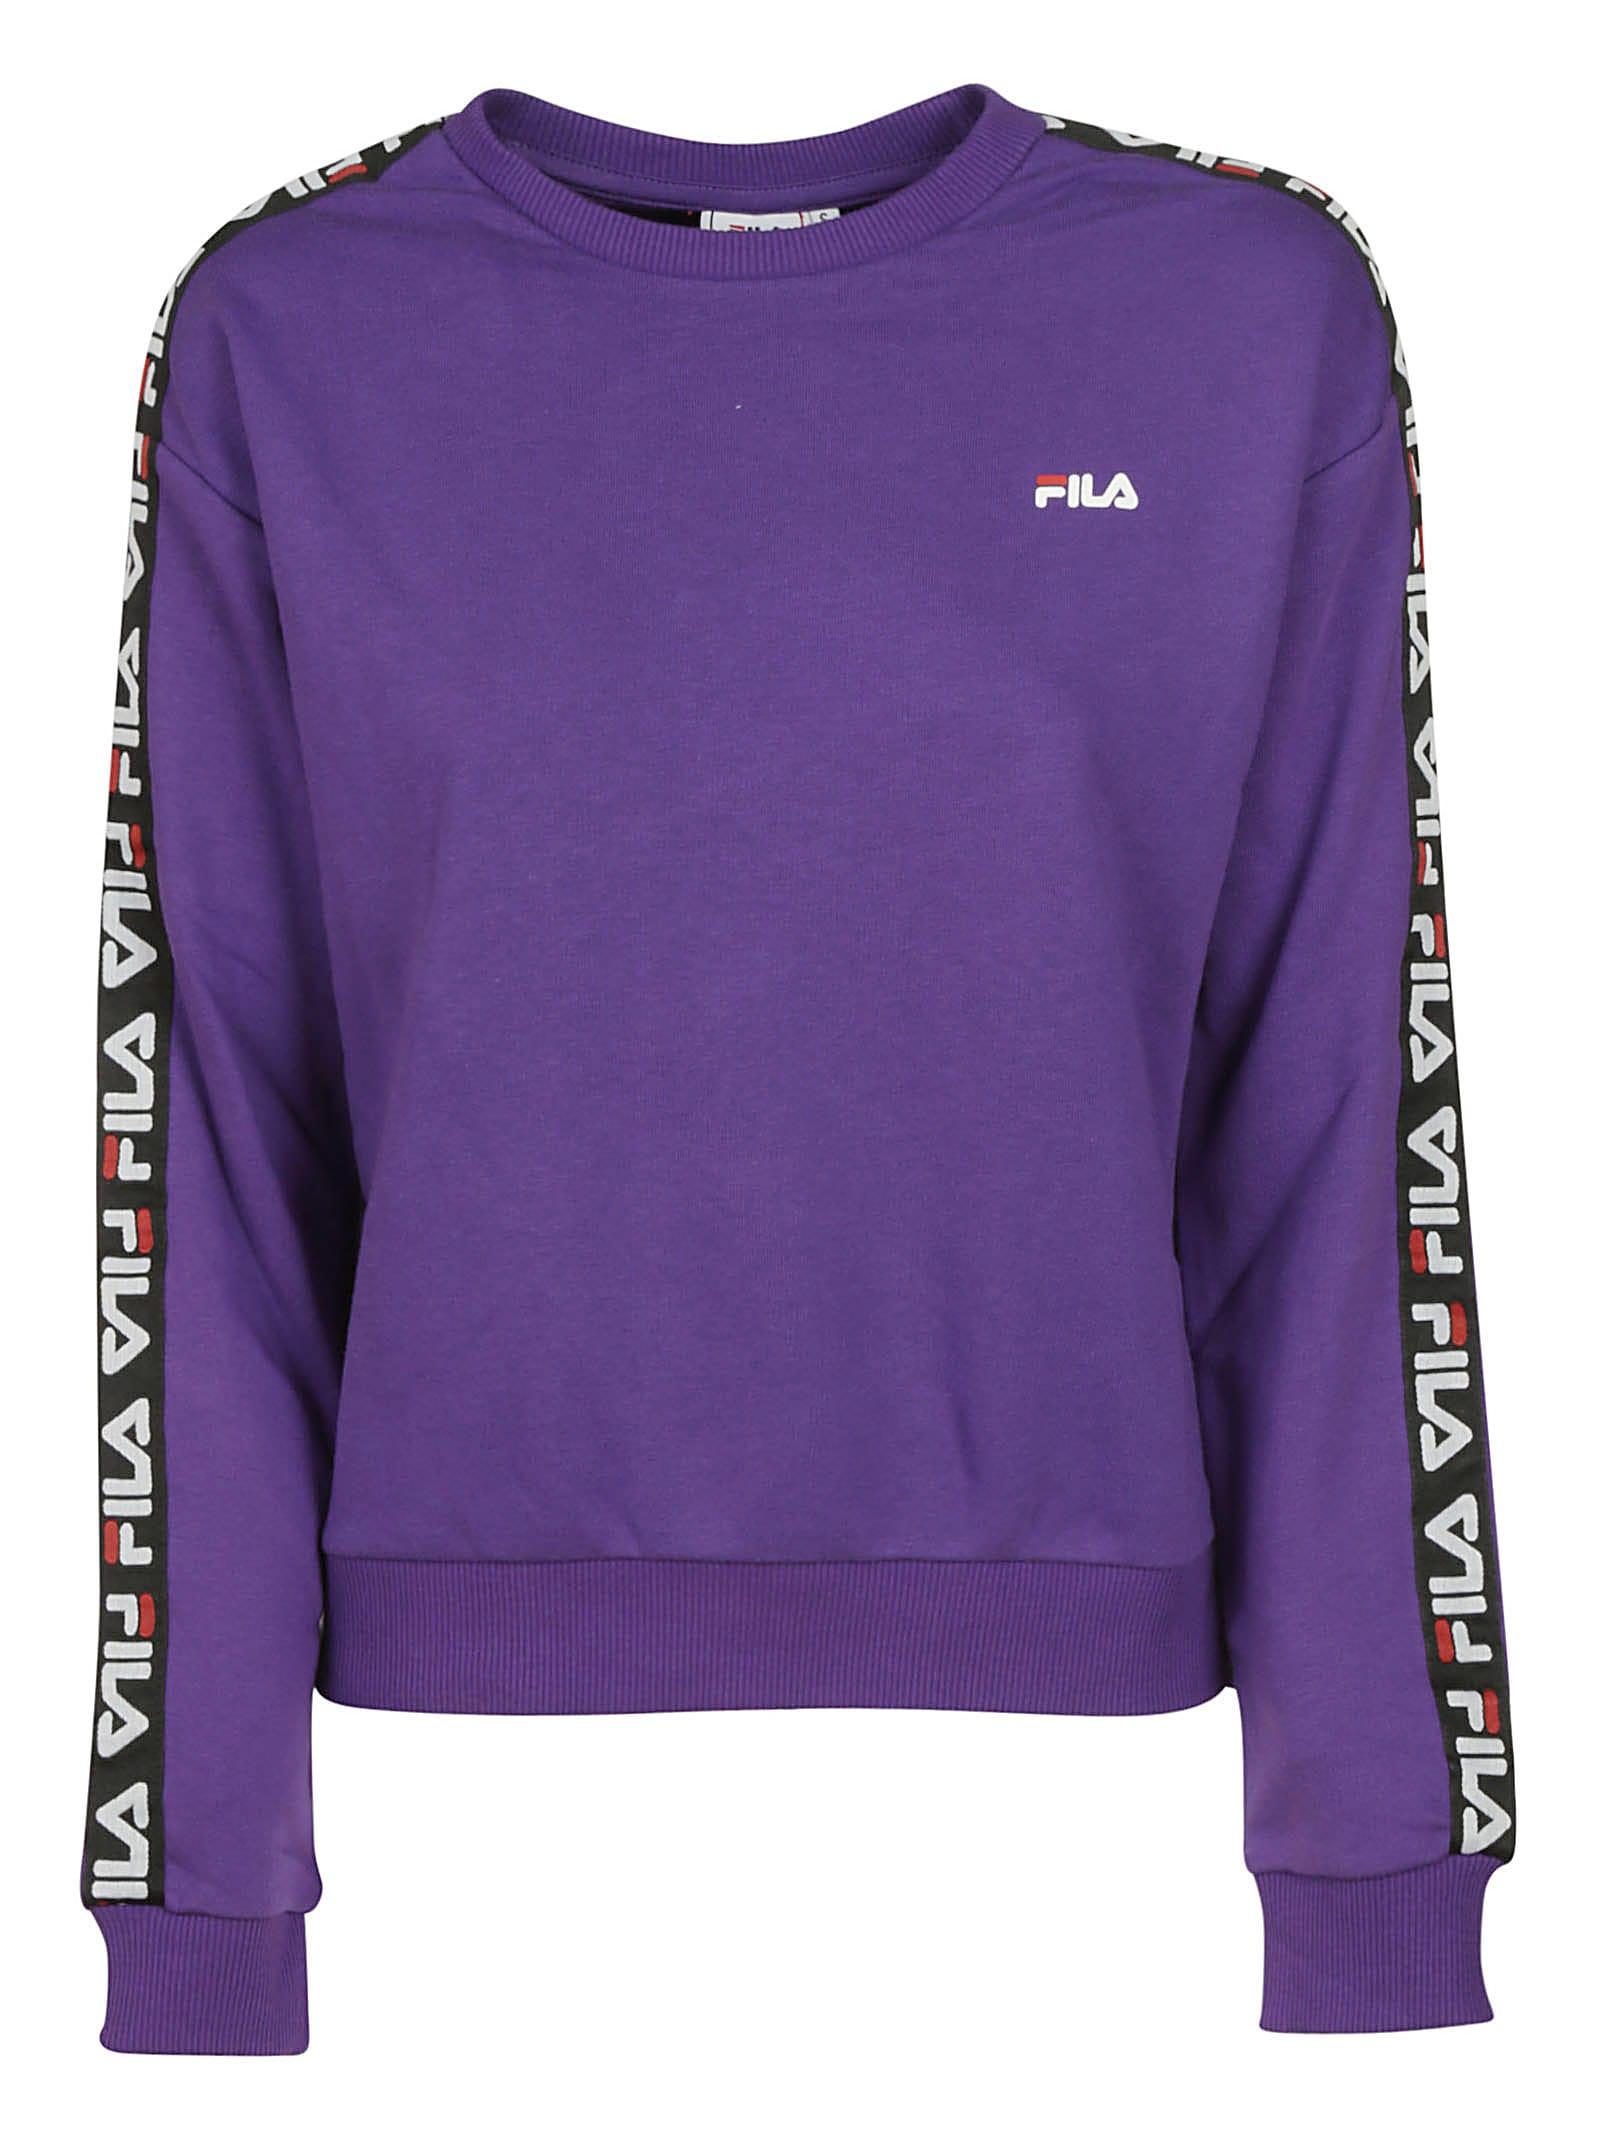 Fila Tivka Crew Sweatshirt